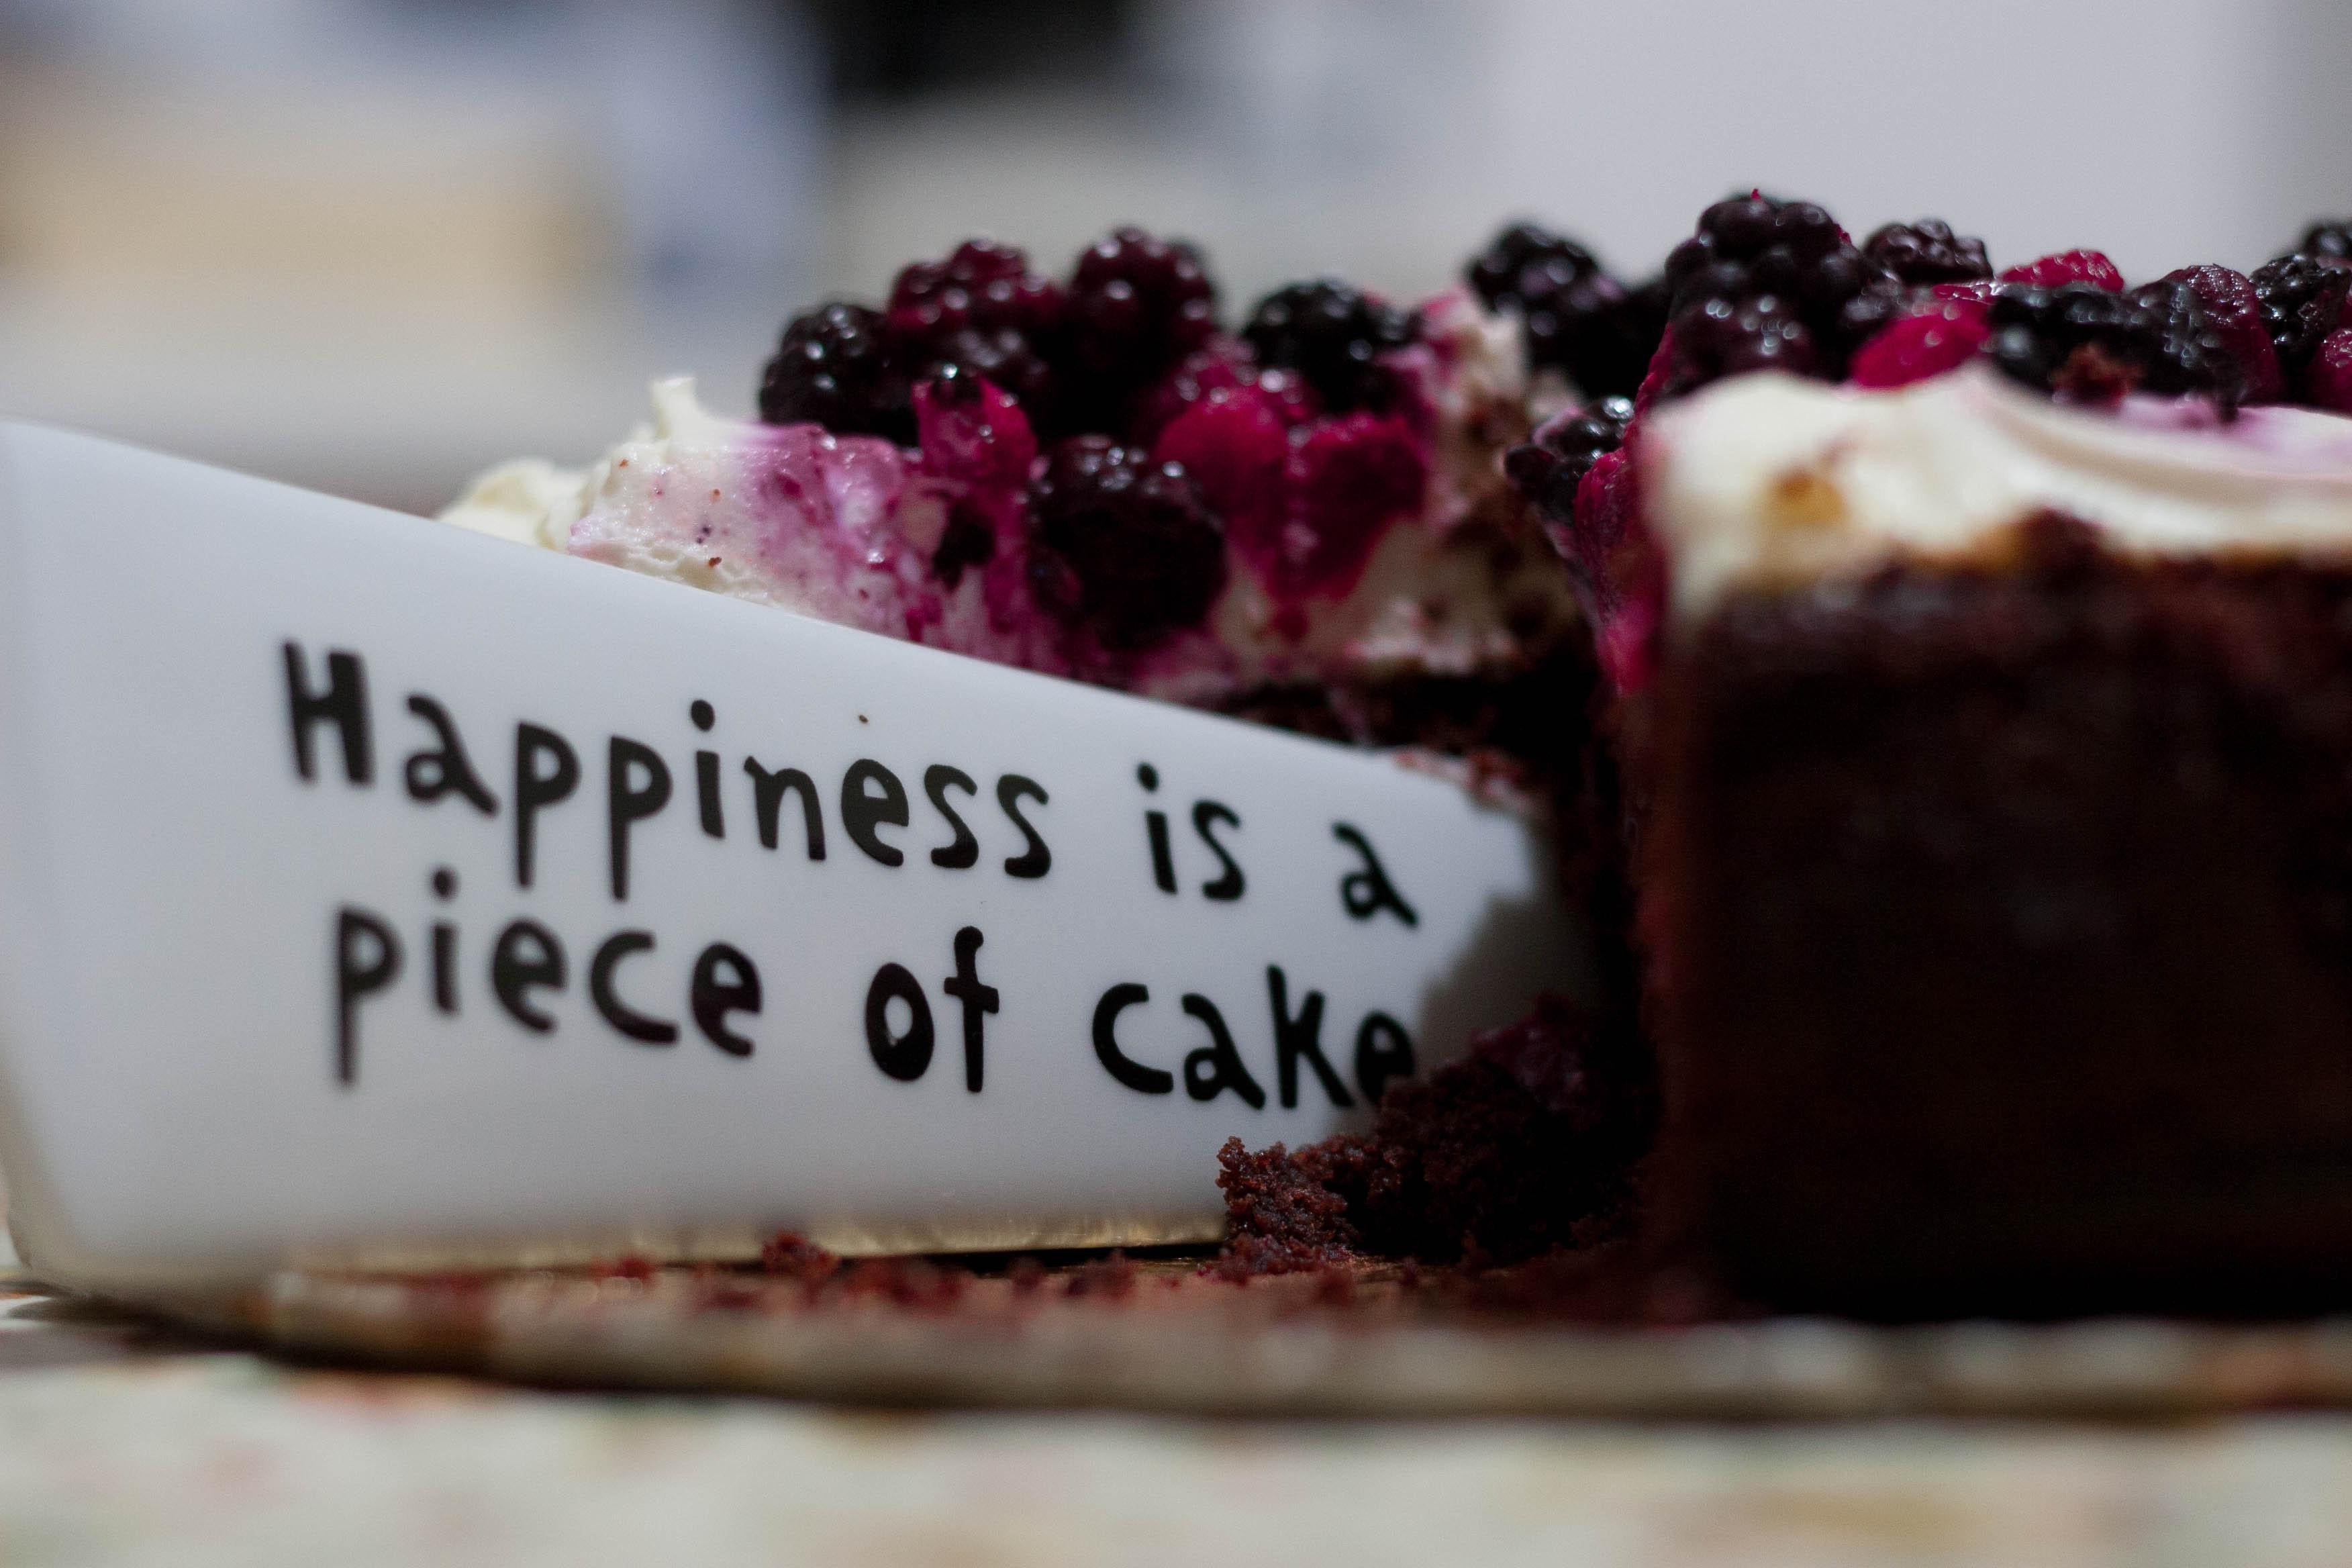 baking-blueberries-blur-227432